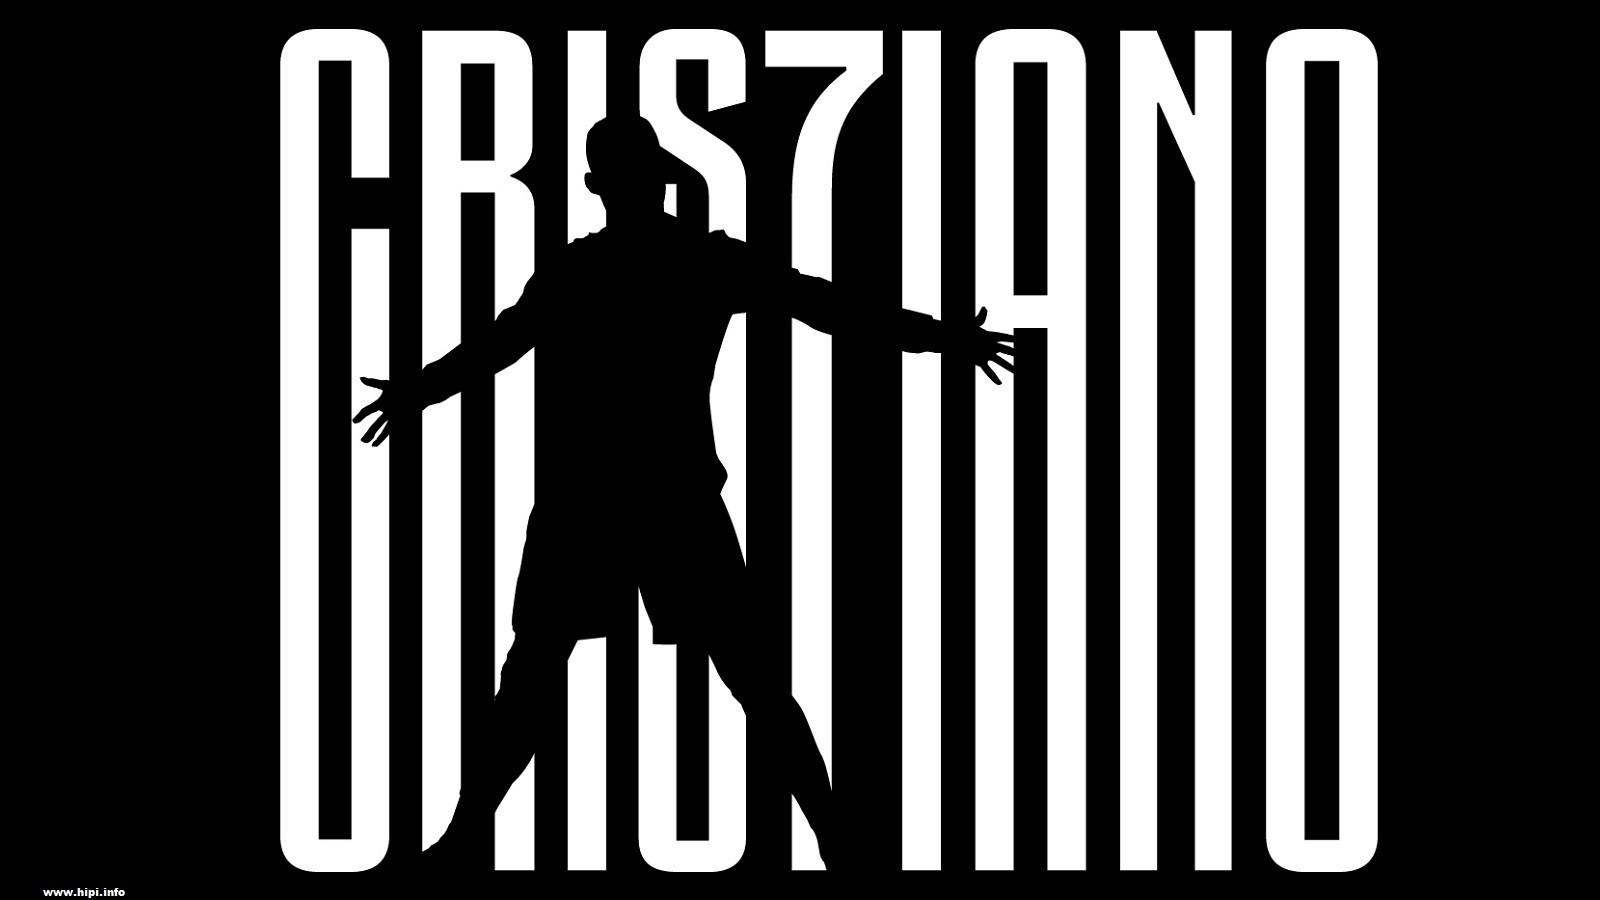 Cristiano Ronaldo Juventus HD Wallpaper Free Download